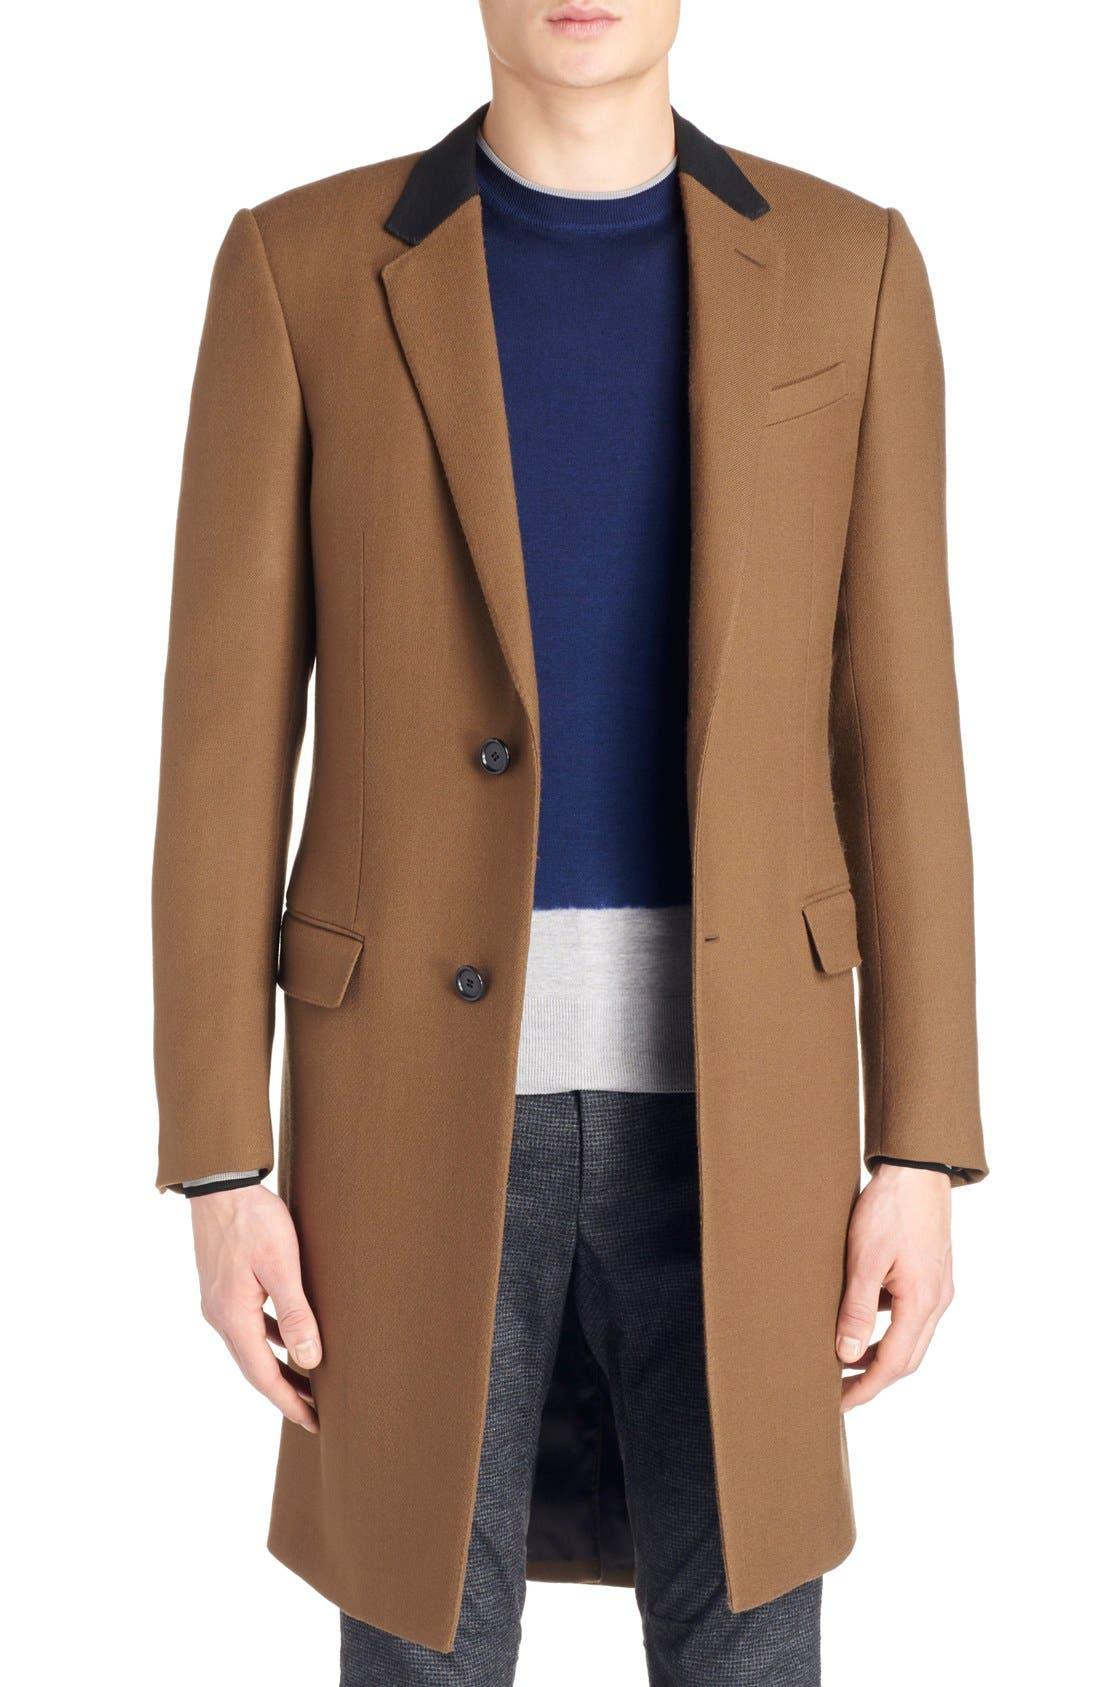 LANVIN, Wool Overcoat, Main thumbnail 1, color, 230